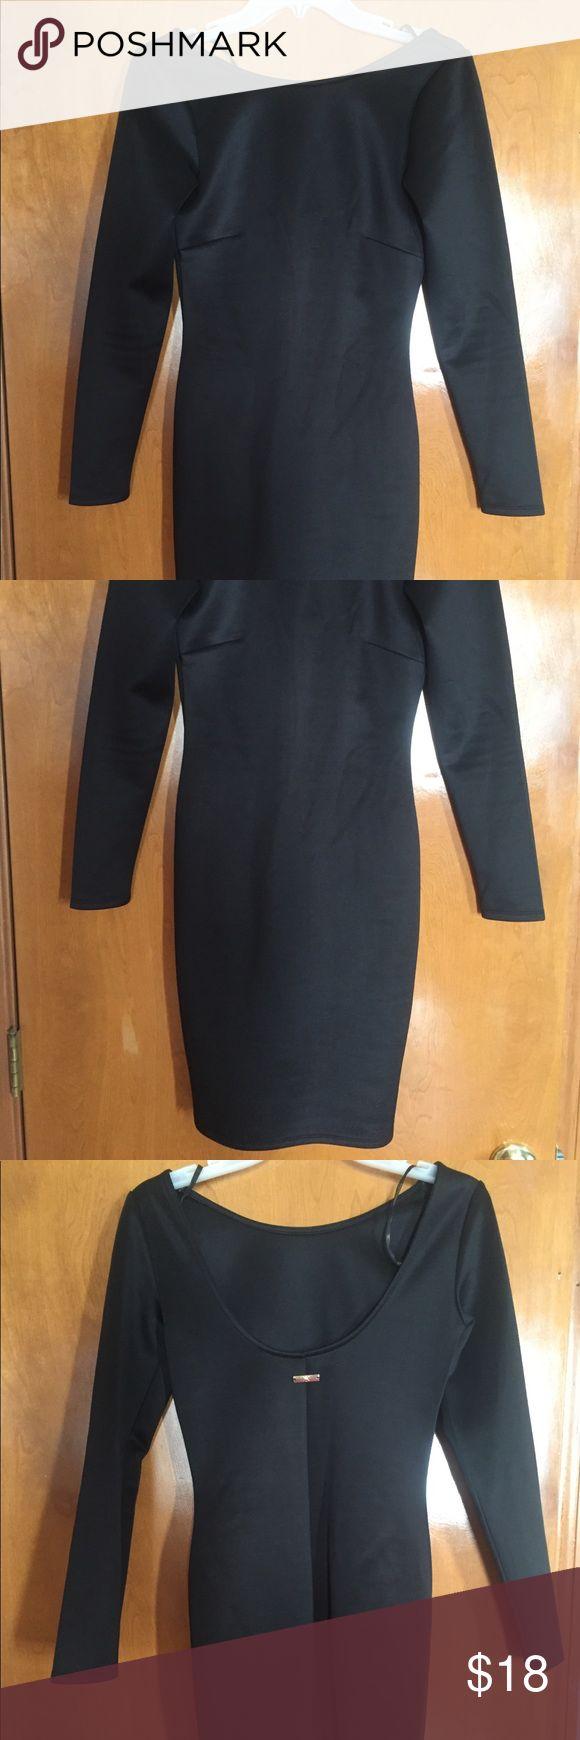 Kardashian kollection black dress Stretchy boat neck black midi dress- worn once Perfect little black dress Kardashian Kollection Dresses Midi